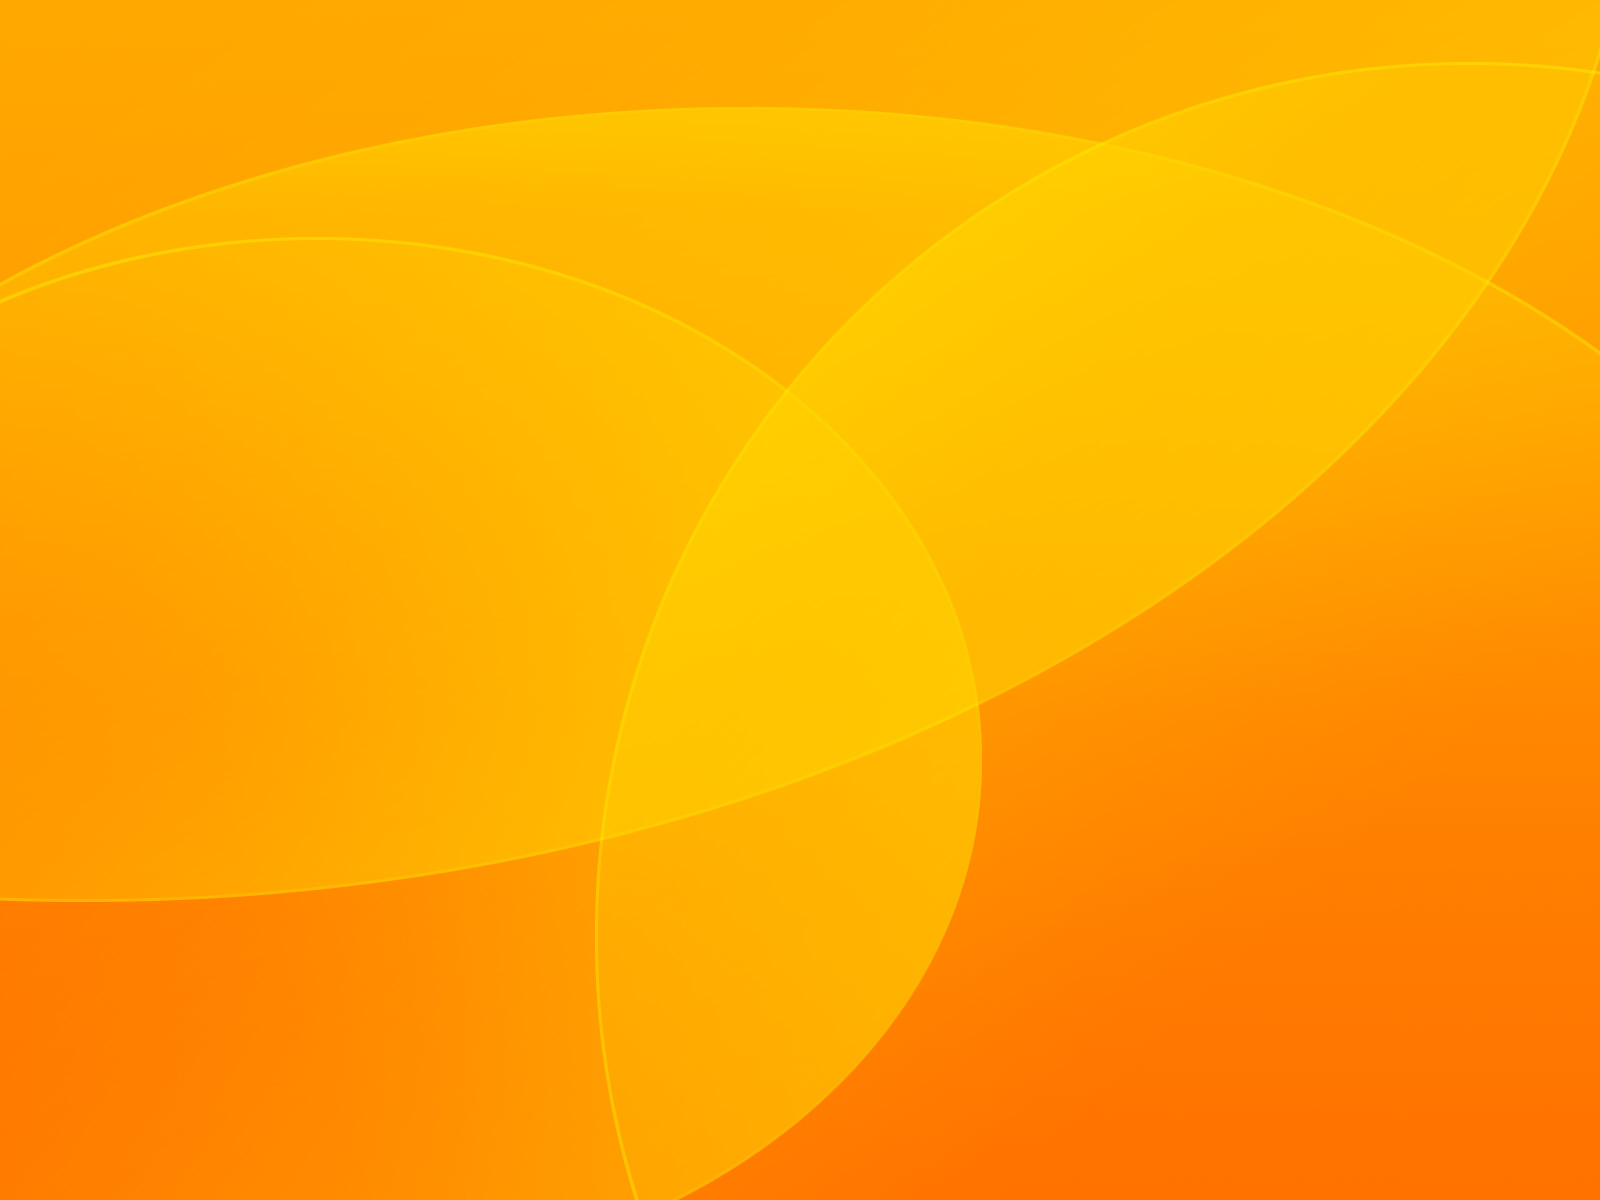 Wallpaper Orange Color 1600x1200